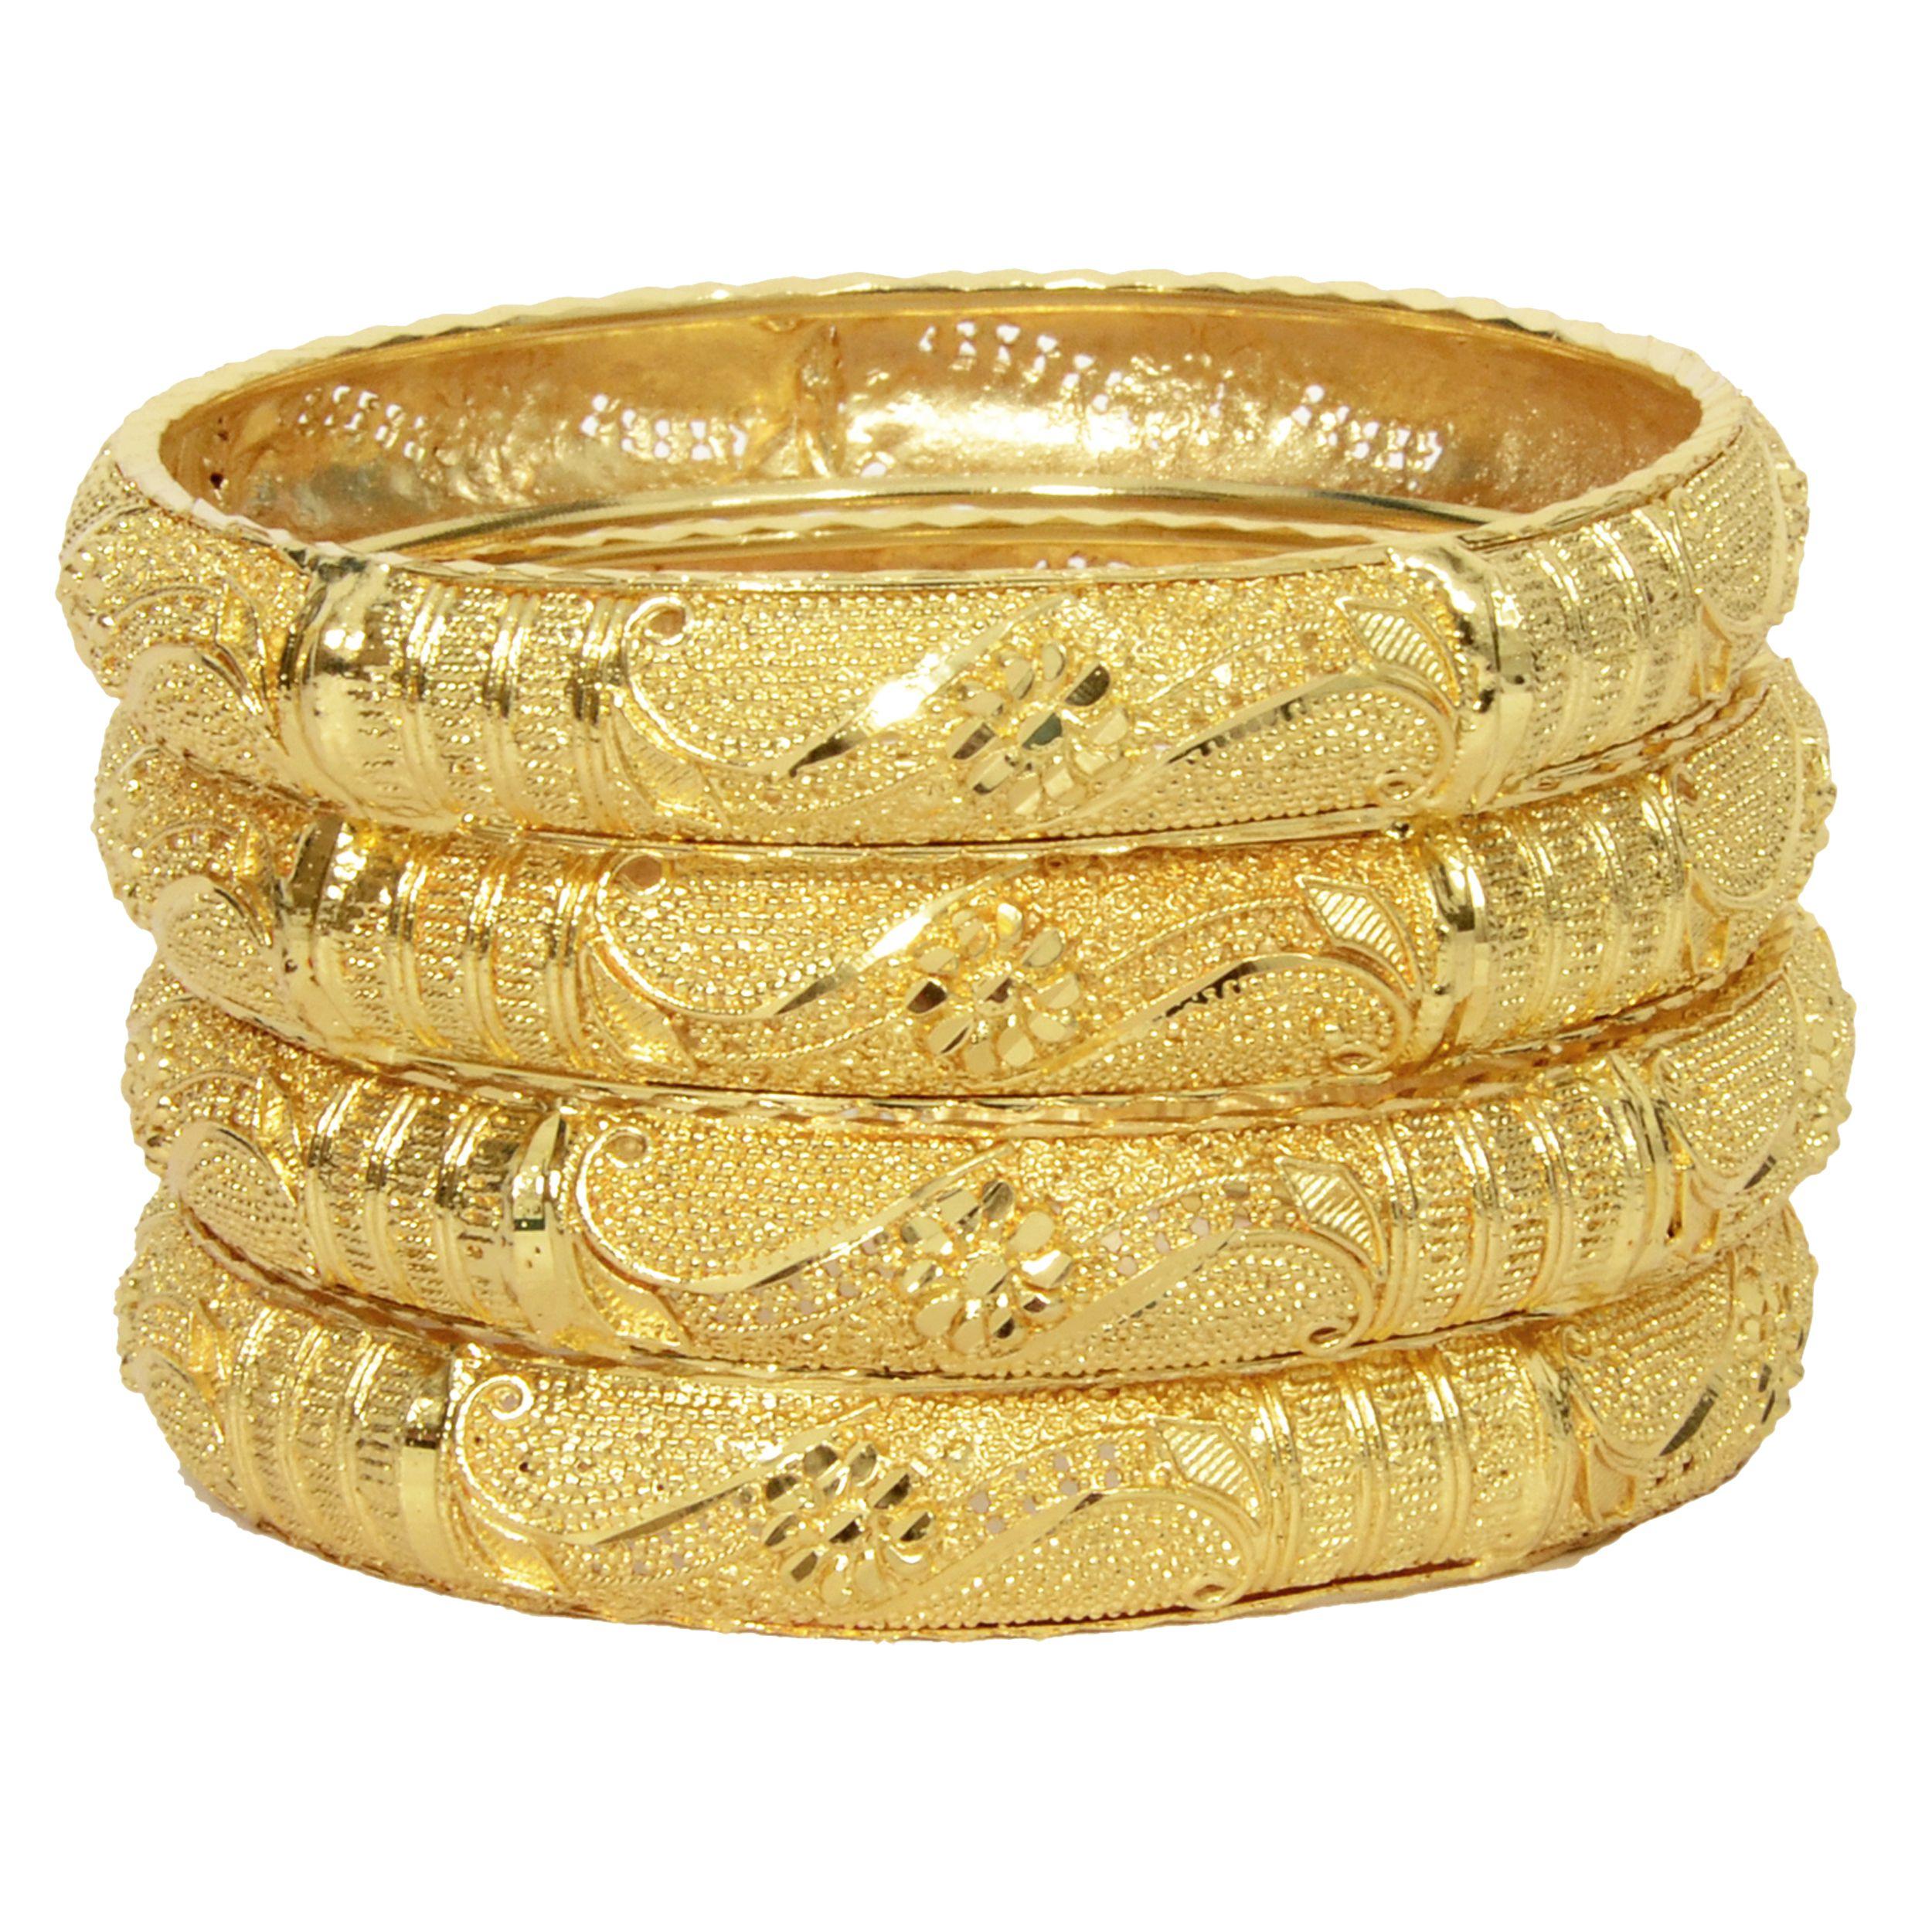 5c5ace05a Mansiyaorange Original Look Gram Gold Bangles For Women: Buy Mansiyaorange  Original Look Gram Gold Bangles For Women Online in India on Snapdeal